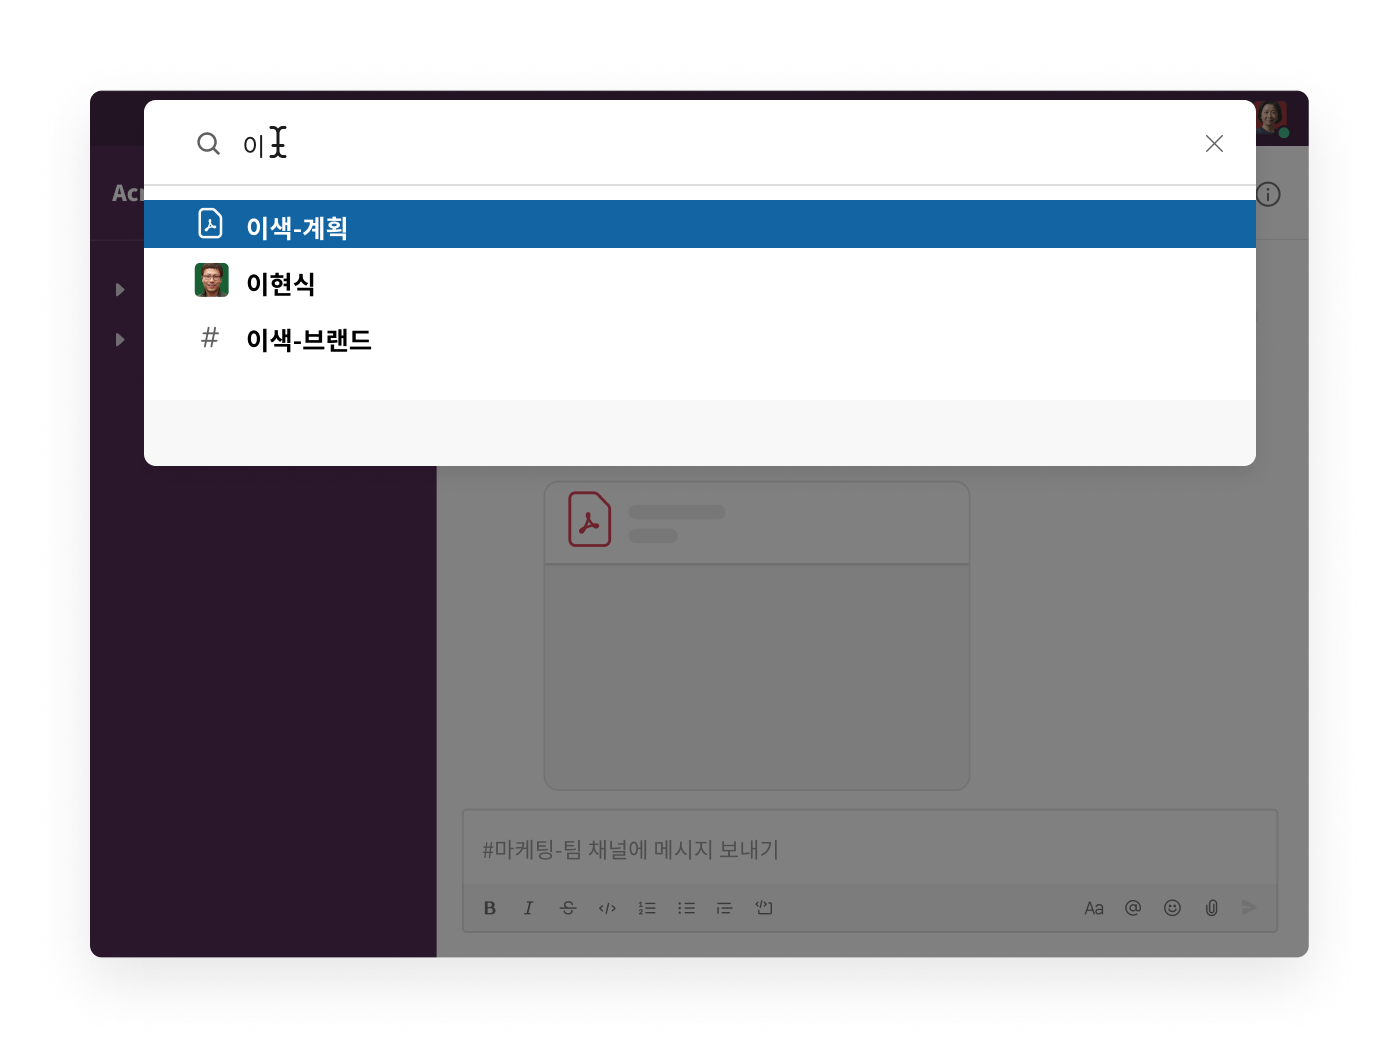 Slack에서 검색 필드에 질의 입력하기